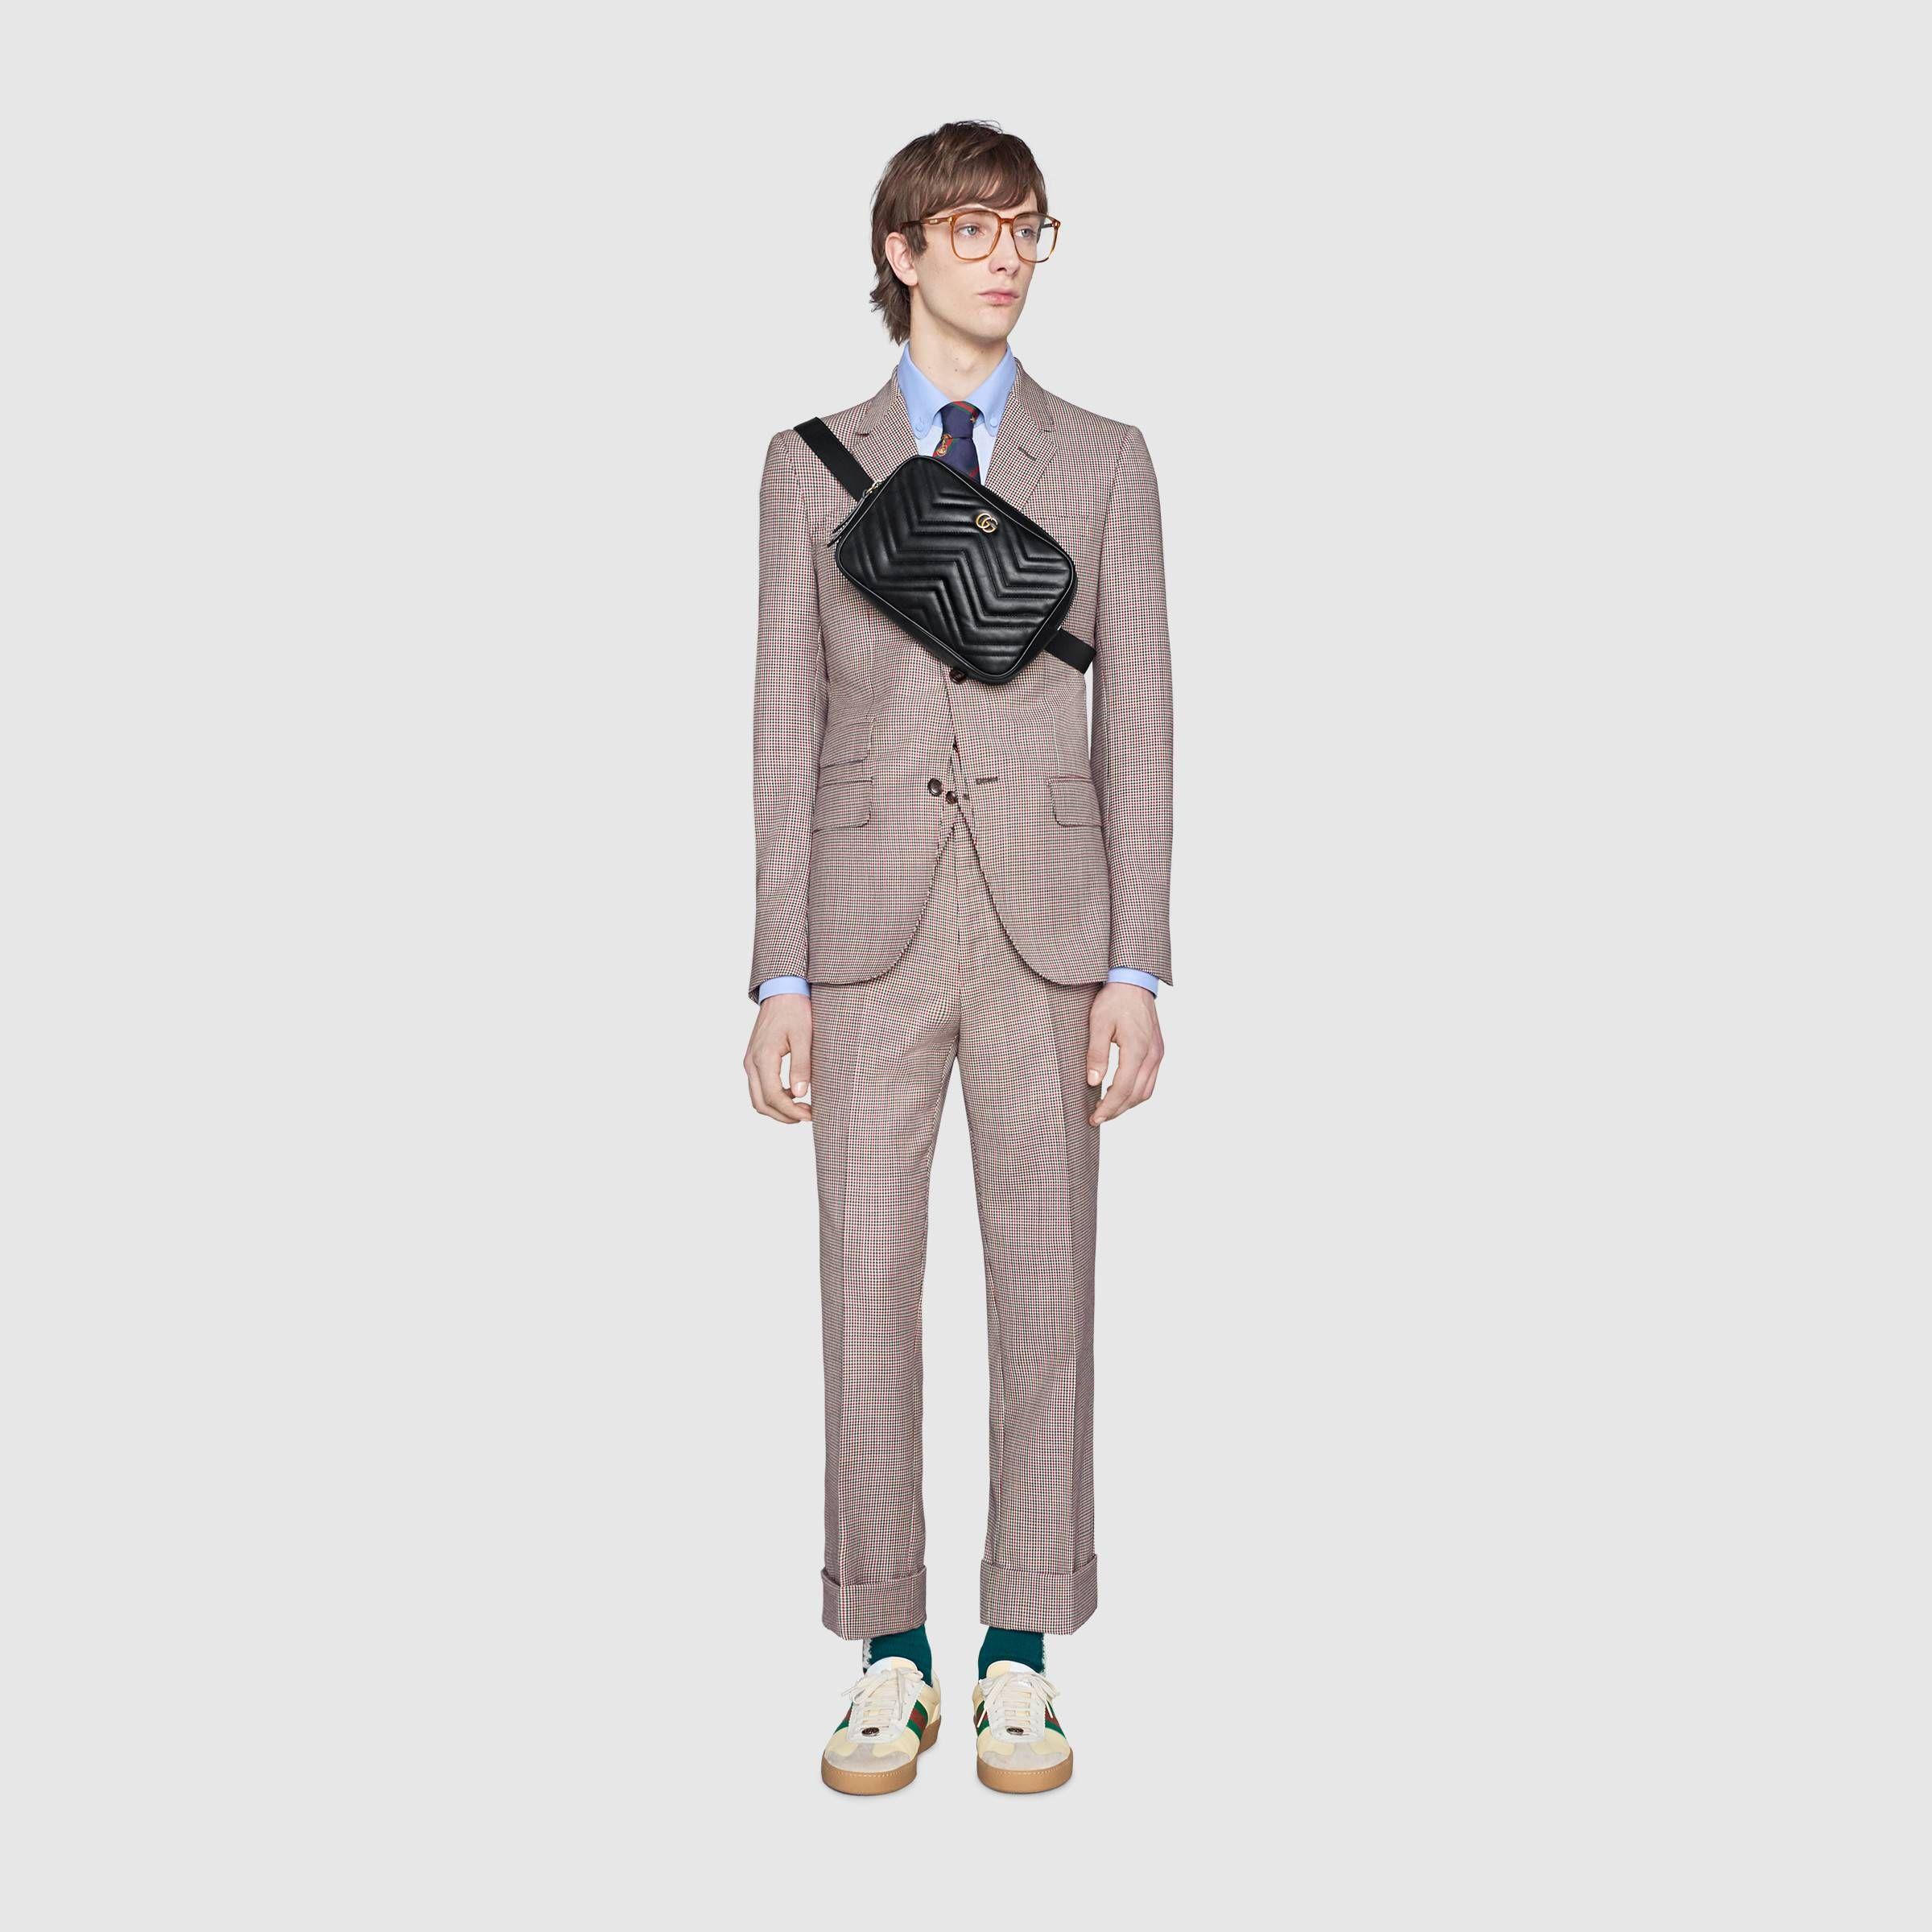 fe9dd514e20ecb GG Marmont matelassé belt bag | Sling bag | Bags, Gucci gifts, Gg ...